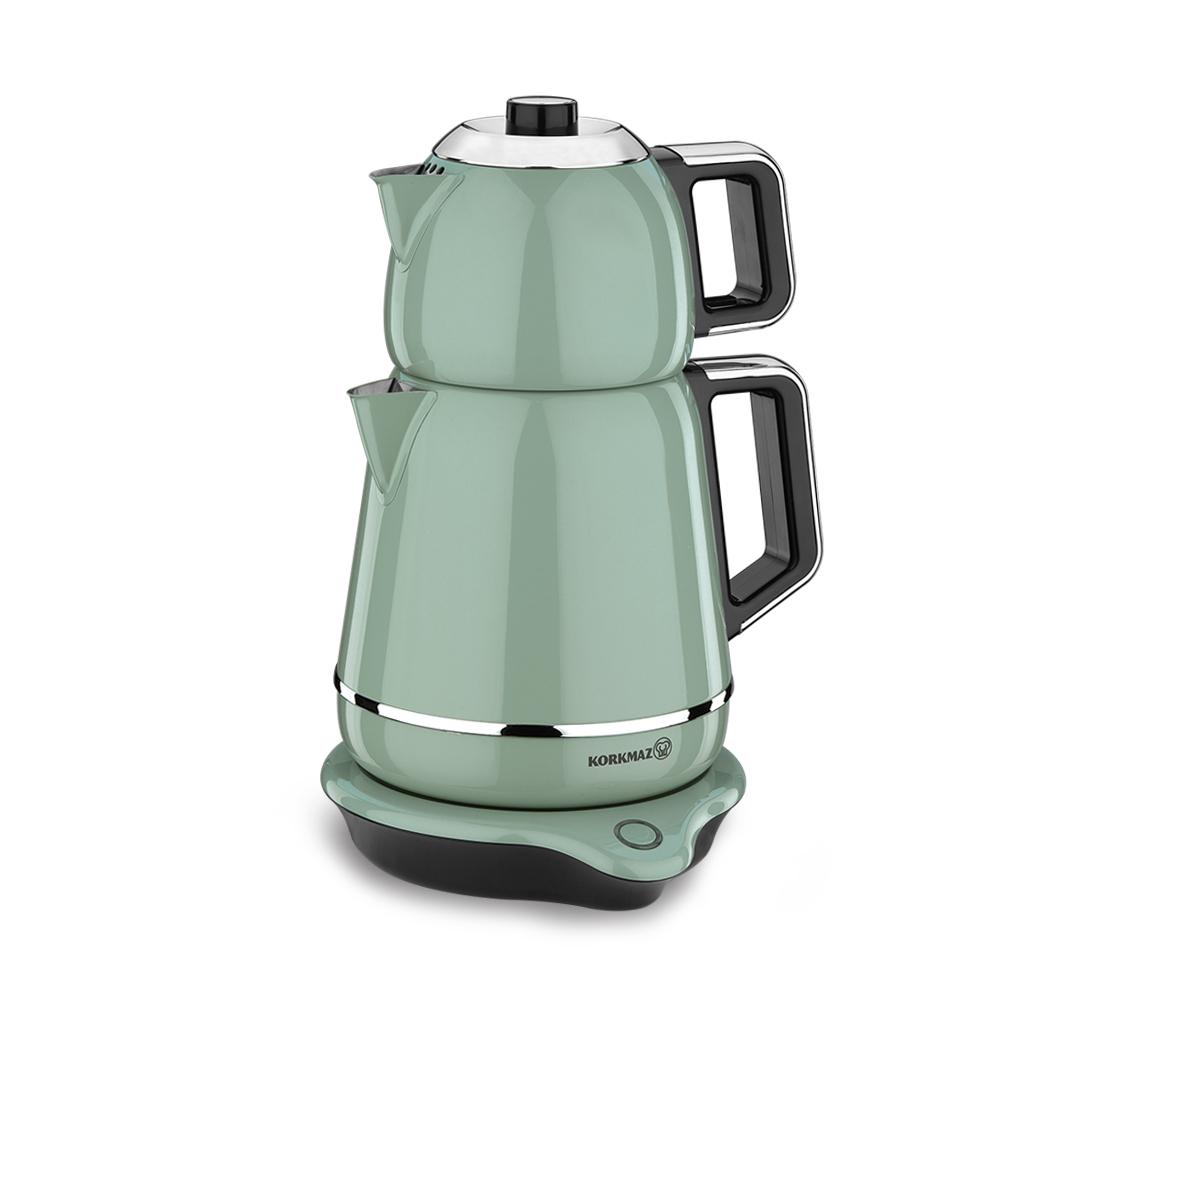 Korkmaz Demiks Turkuaz/Krom Elektrikli Çaydanlık